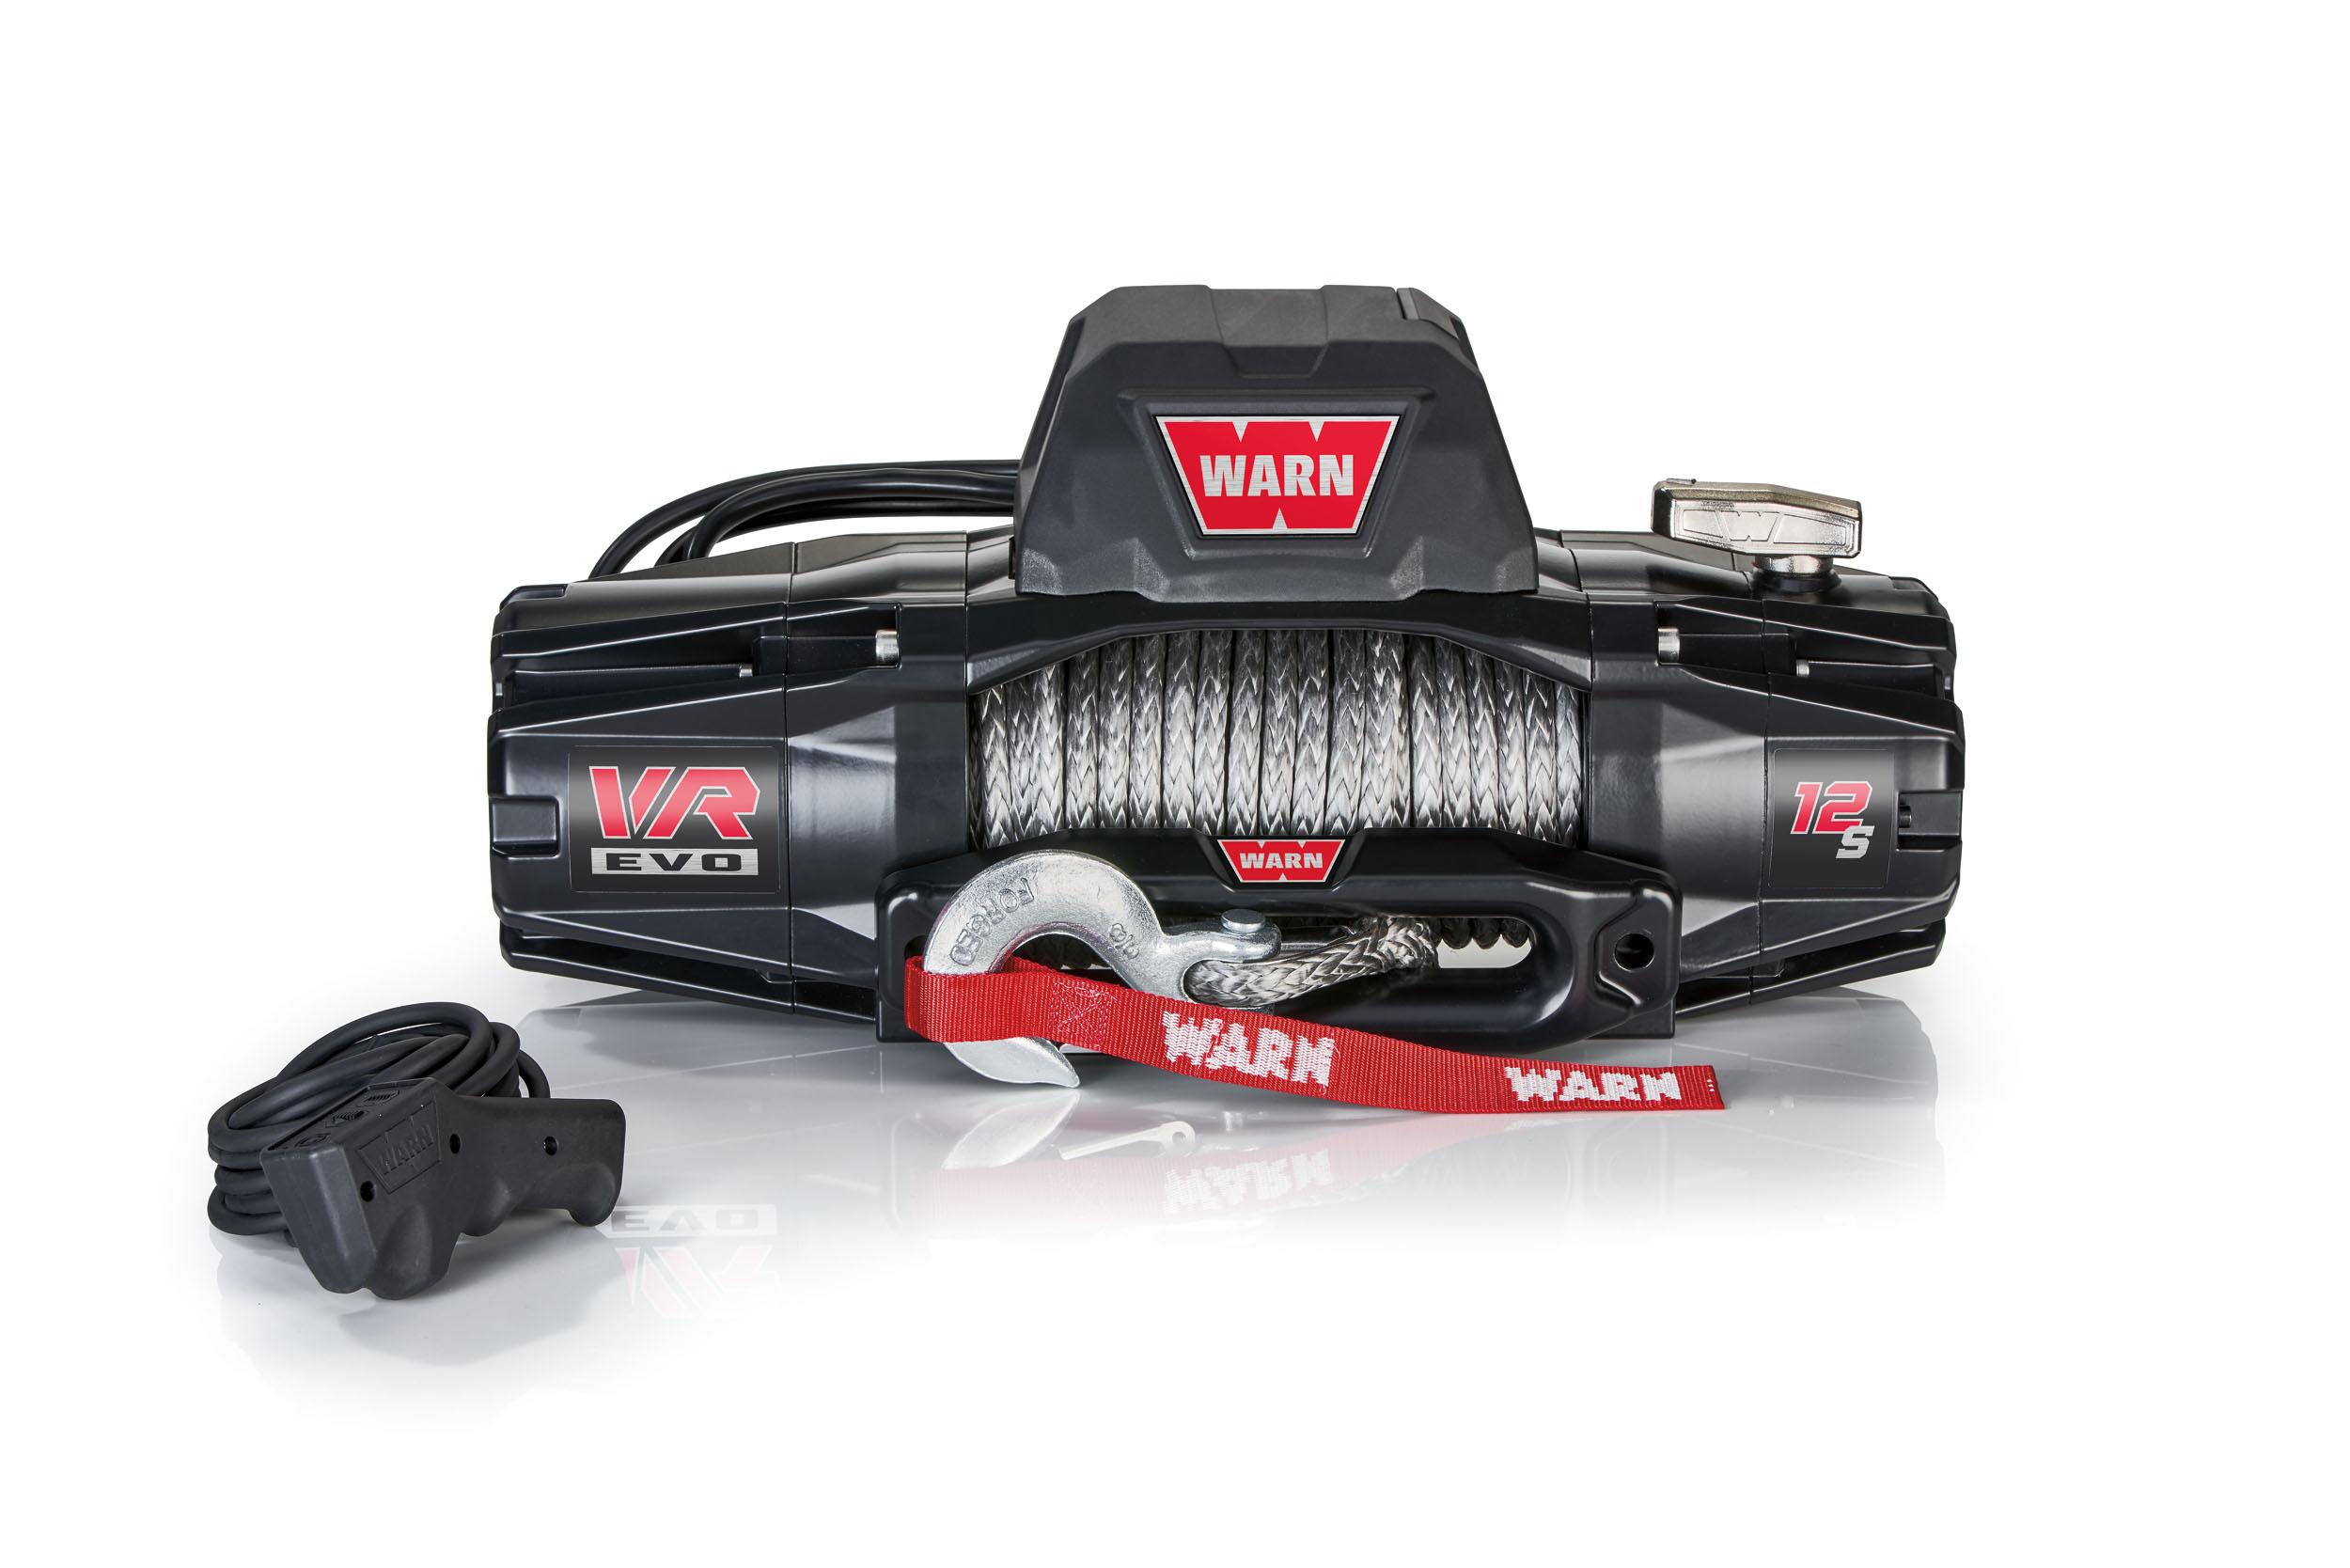 Warn VR EVO winch with controller